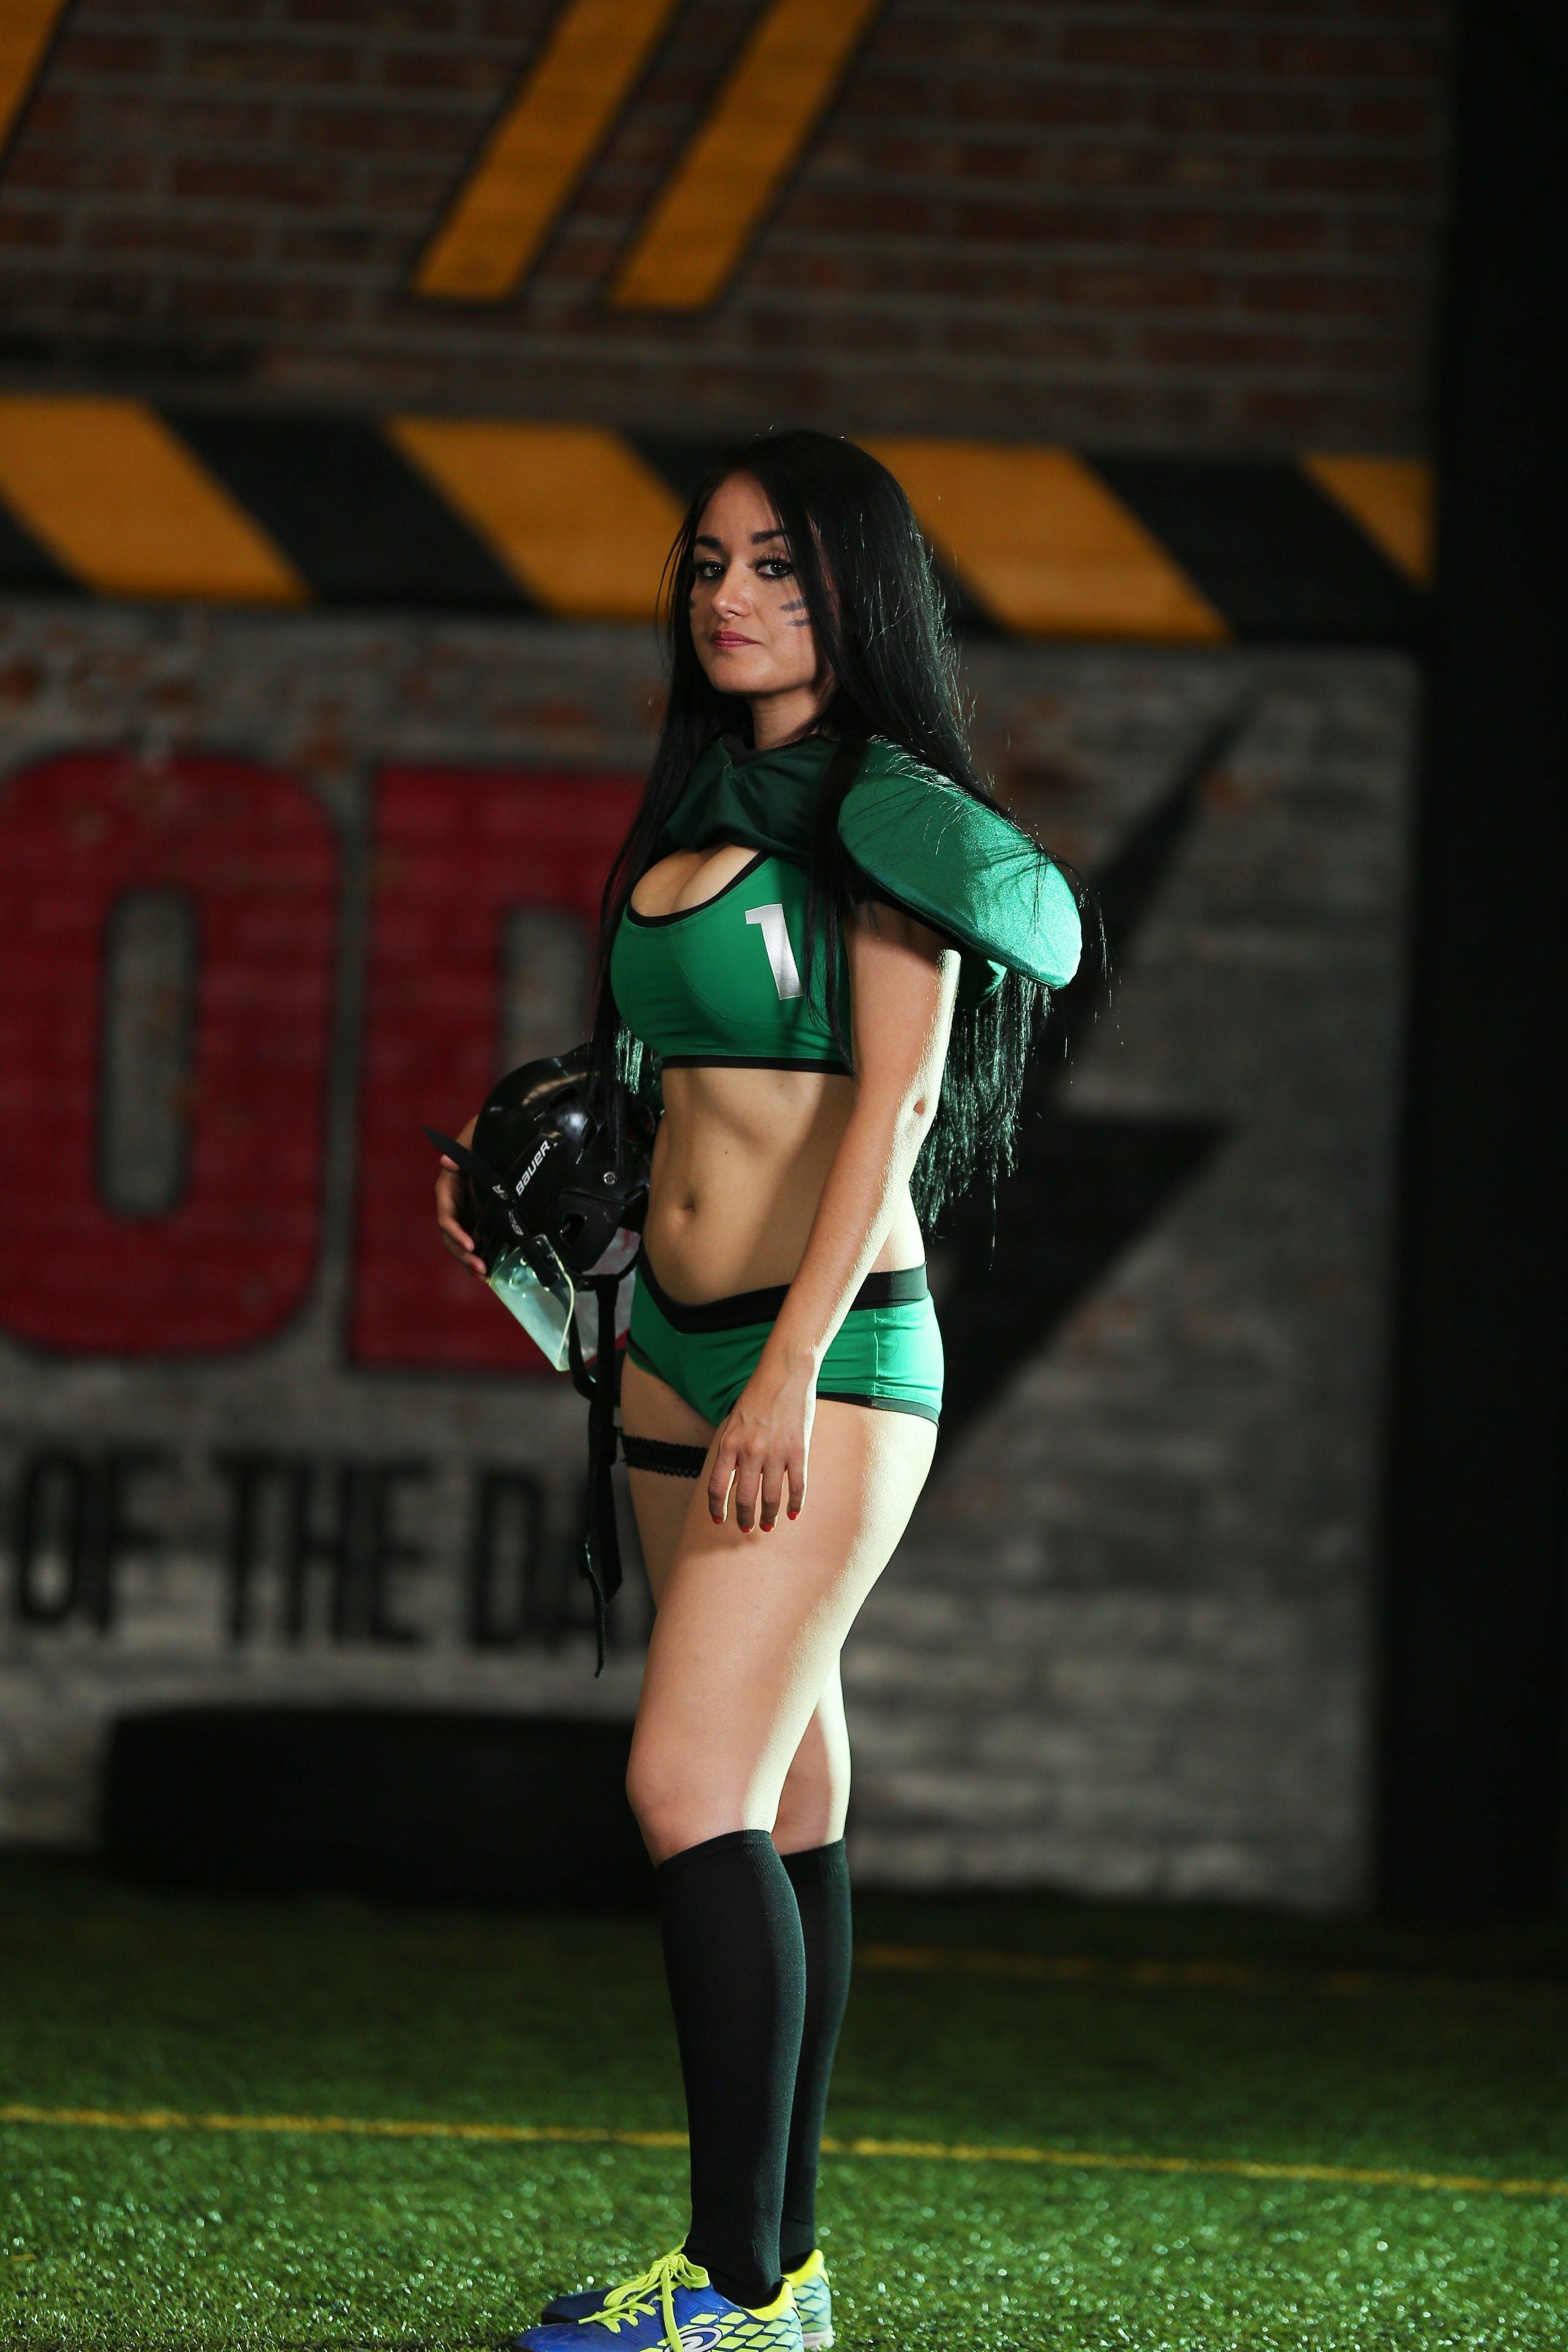 Woman Wearing Green Sports Uniform